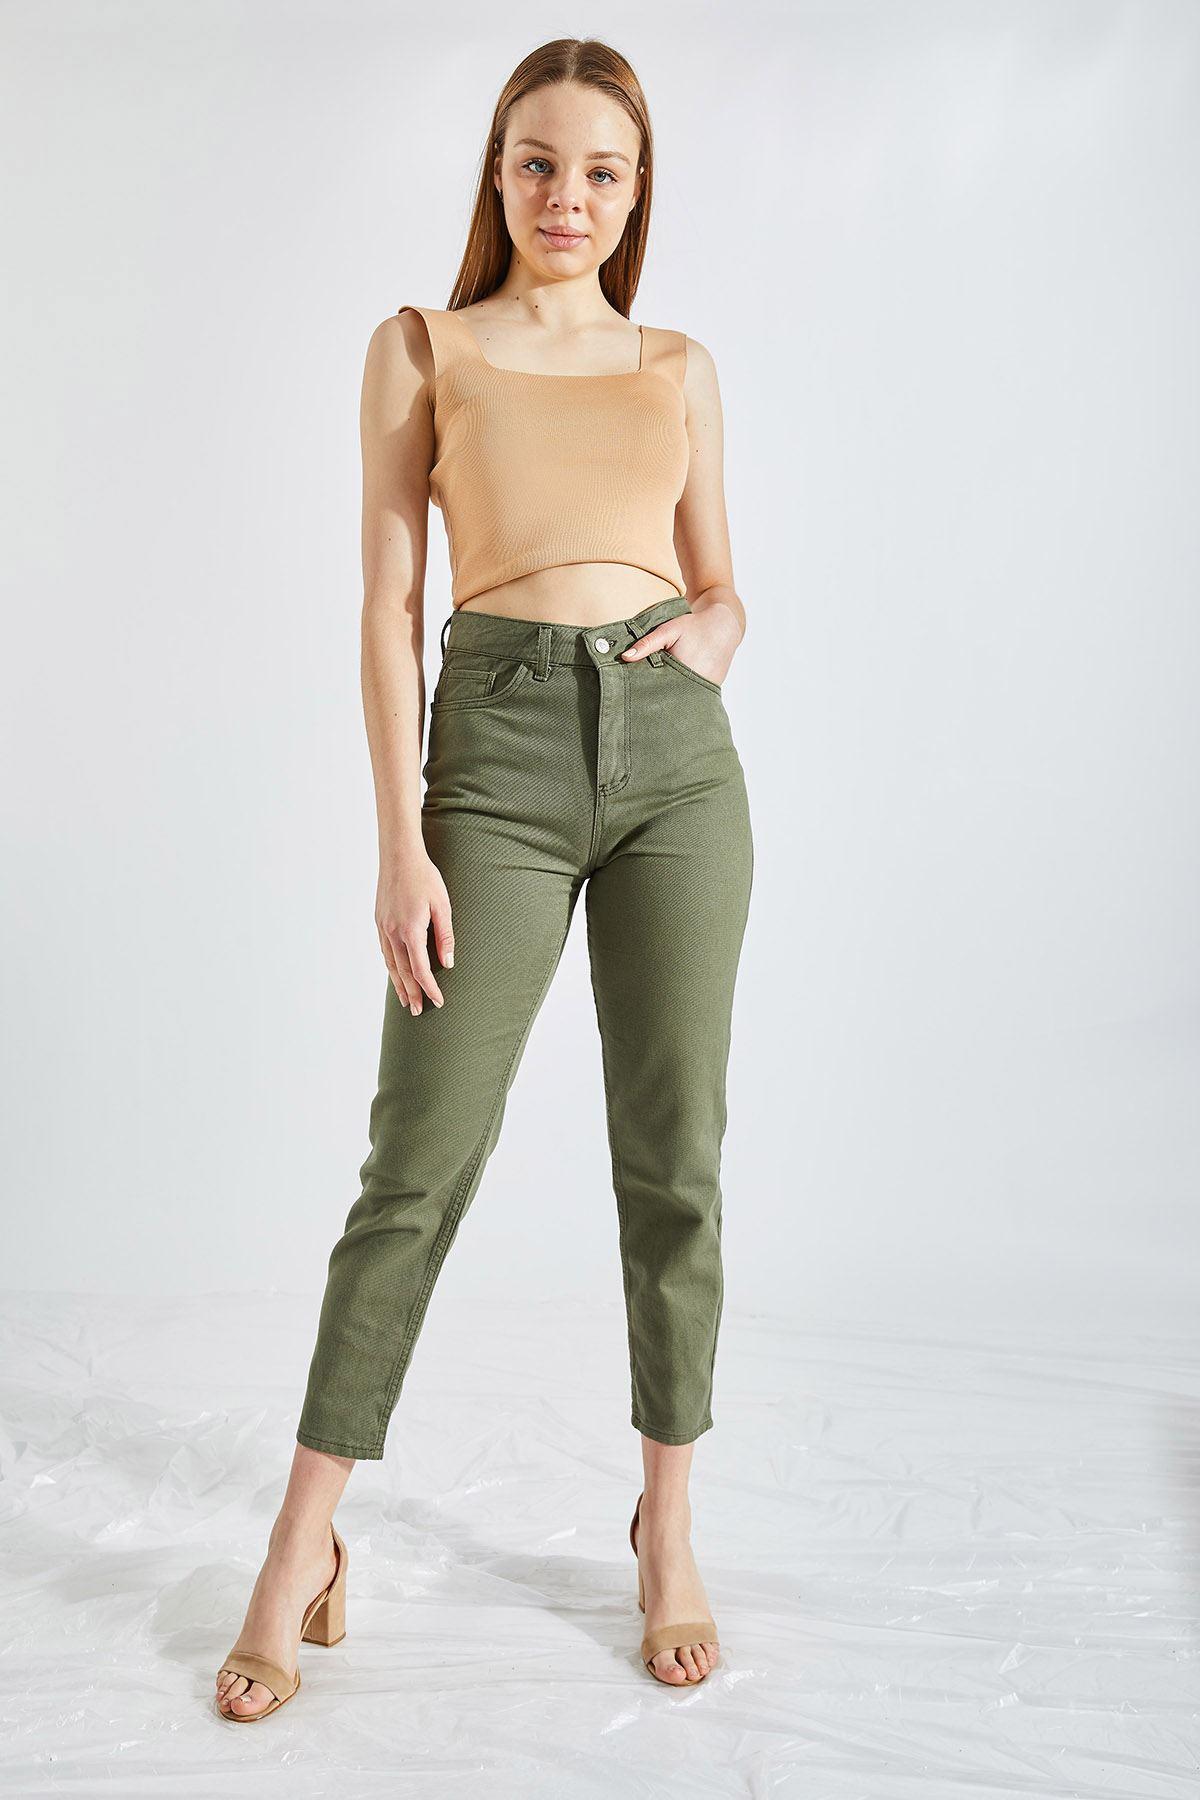 Kadın Boyfriend Haki Kot Pantolon